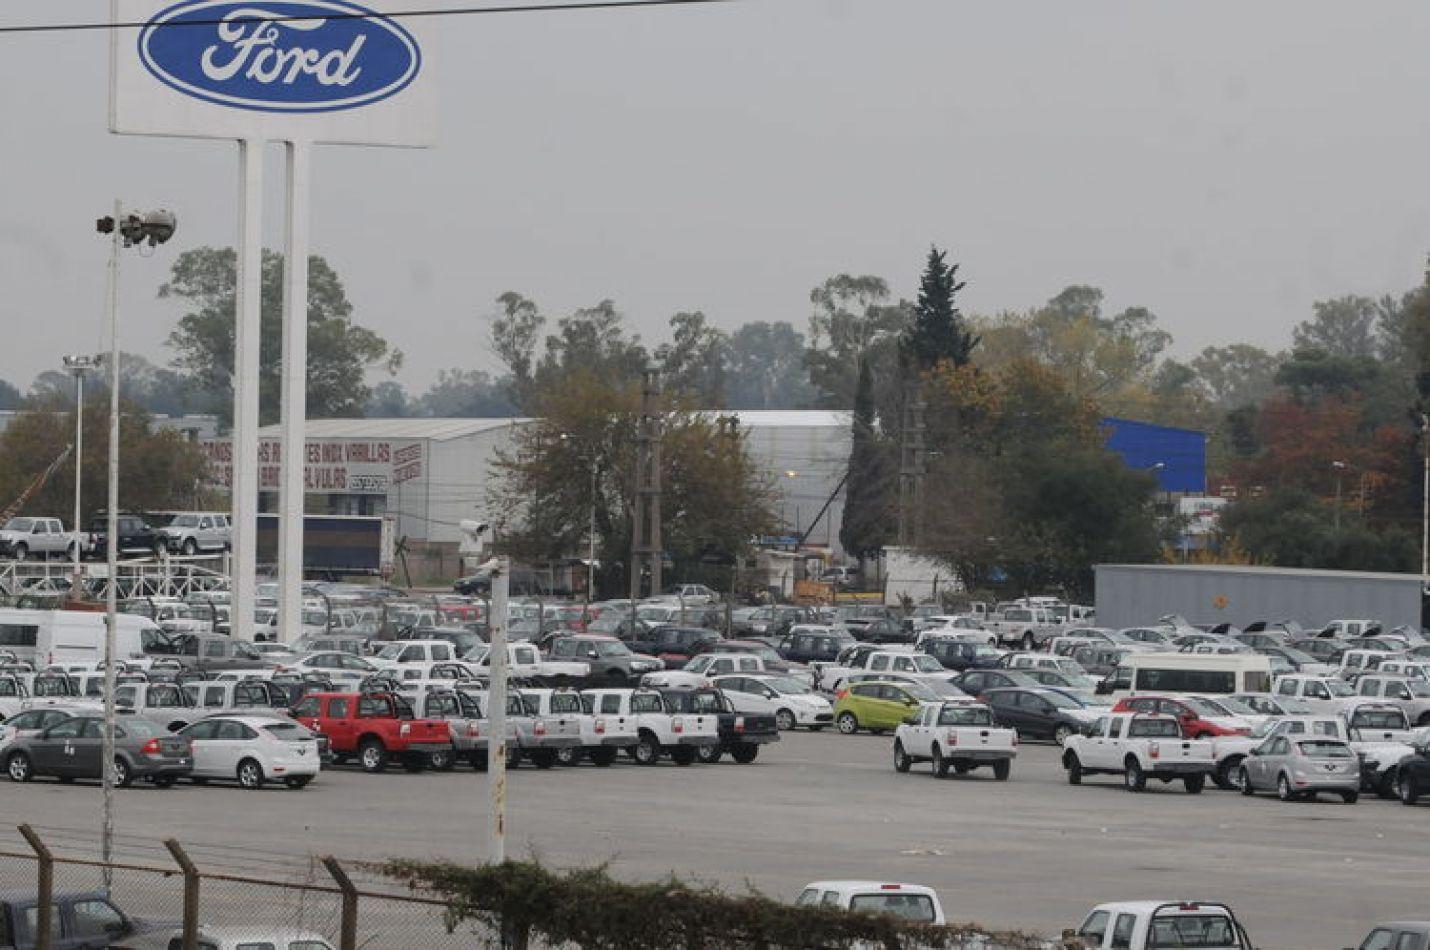 Planta Ford en Pacheco